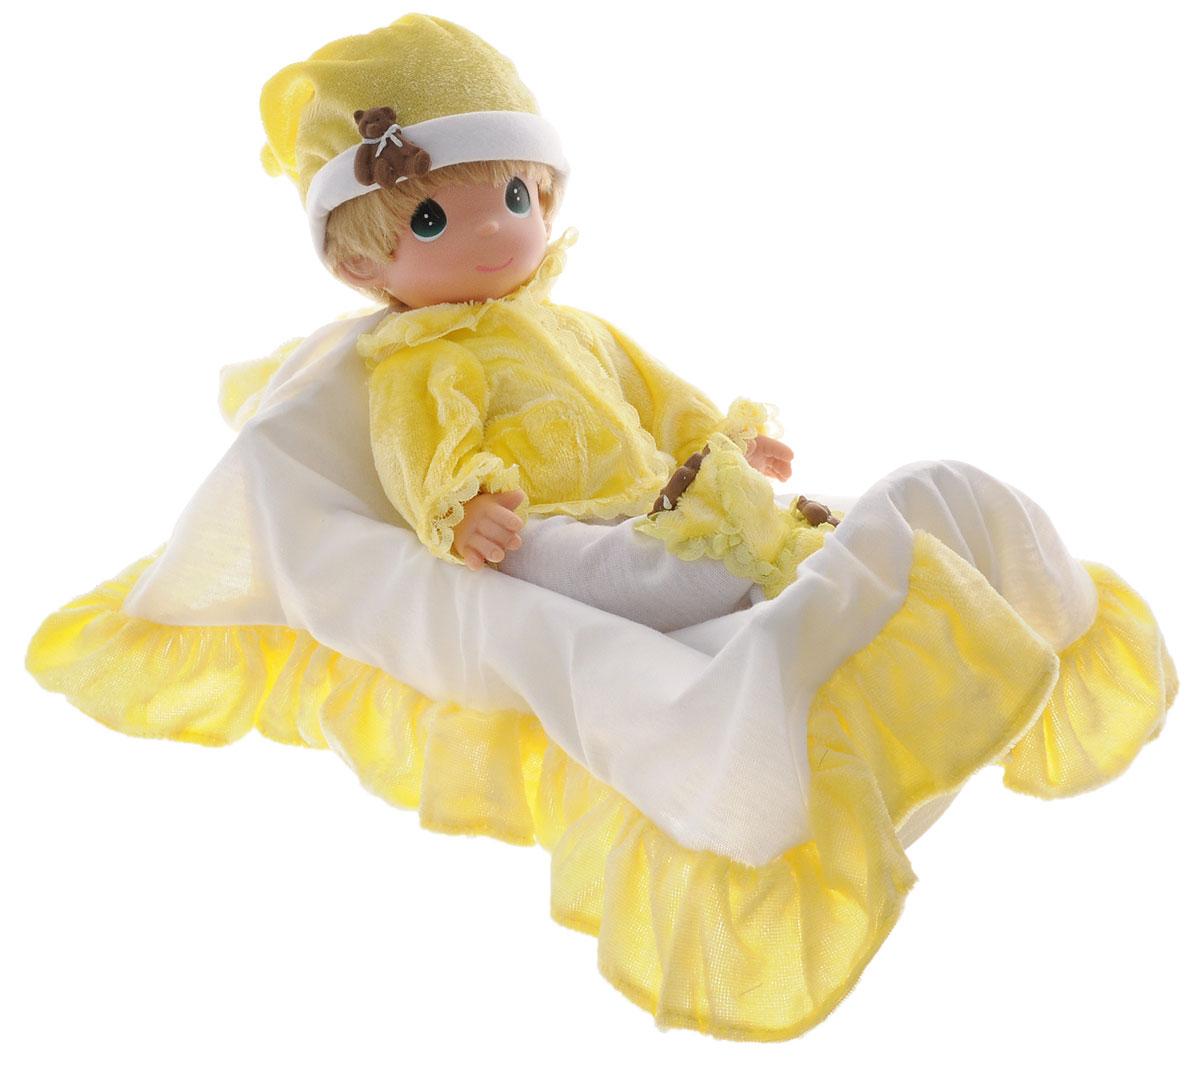 Precious Moments Кукла Рок-бай младенцев мальчик куклы и одежда для кукол precious кукла с зонтиком 30 см